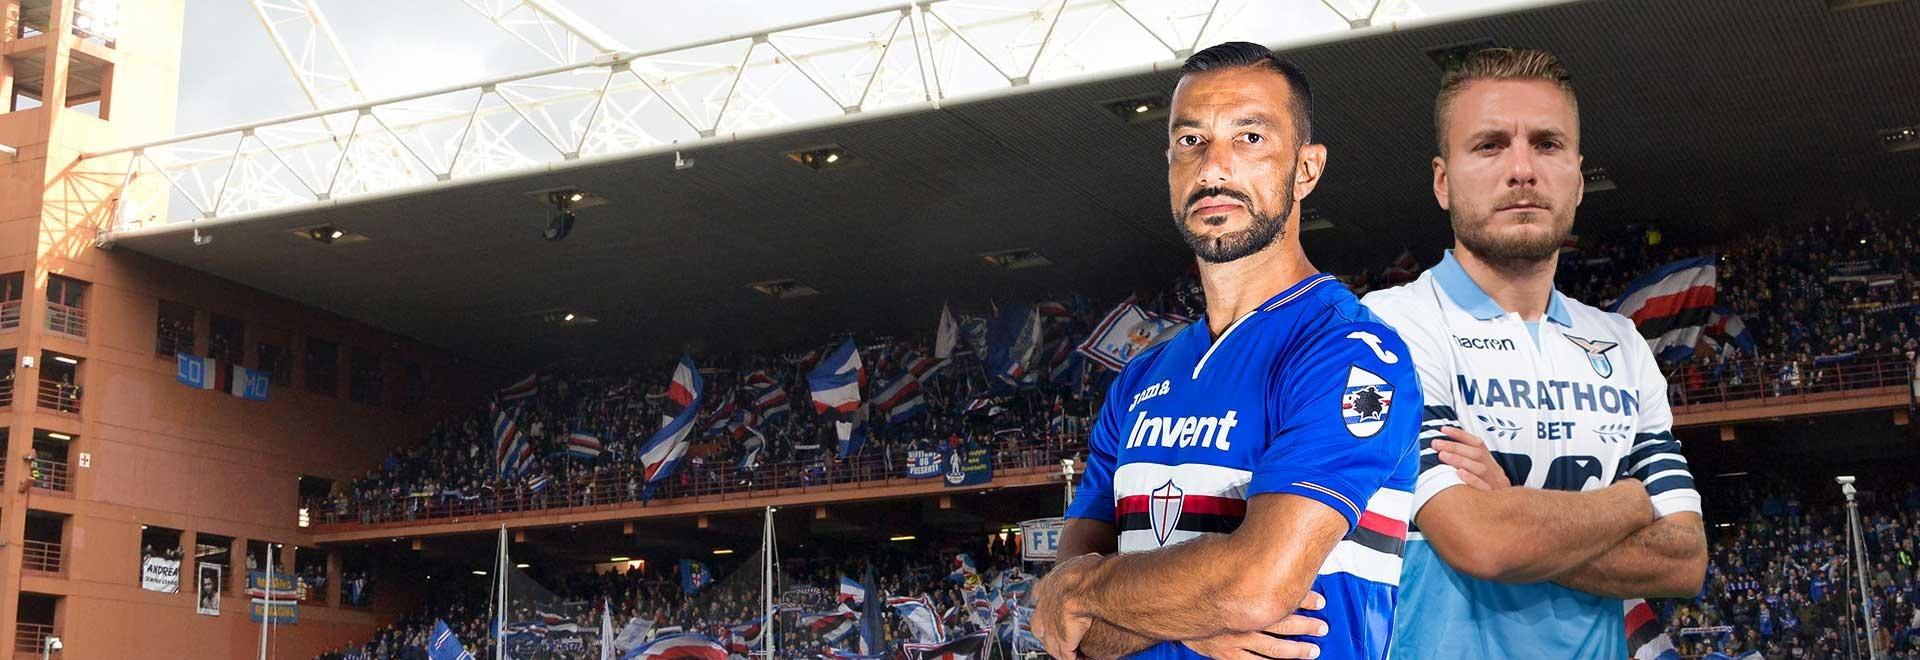 Sampdoria - Lazio. 34a g.